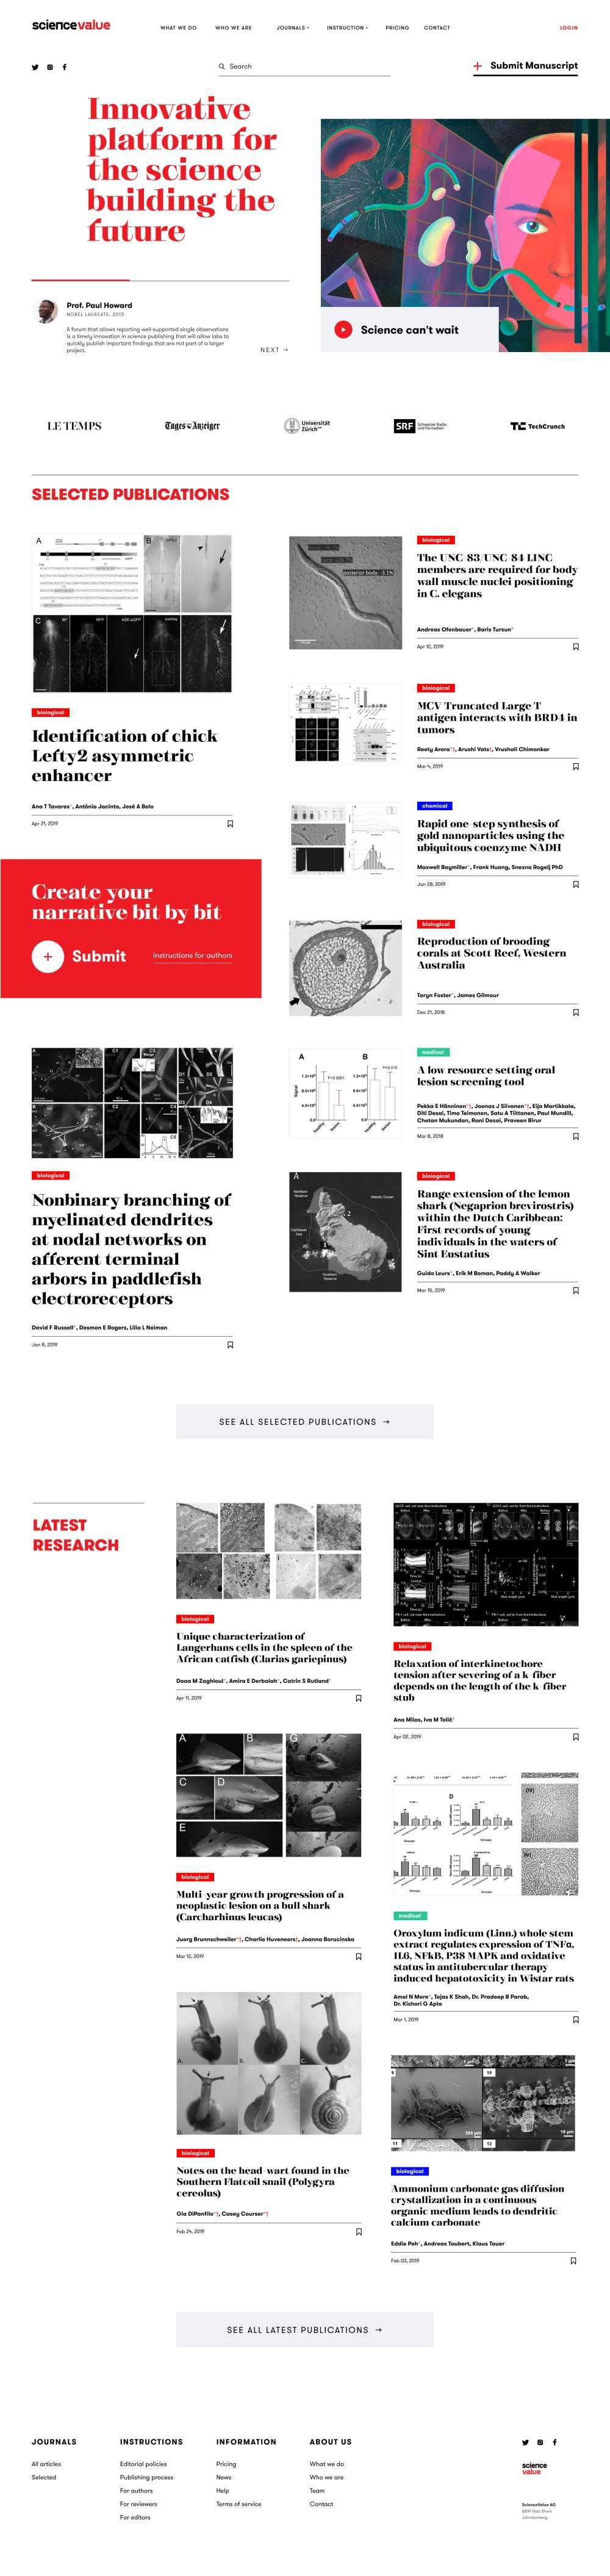 Education-Web-Design-Inspiration